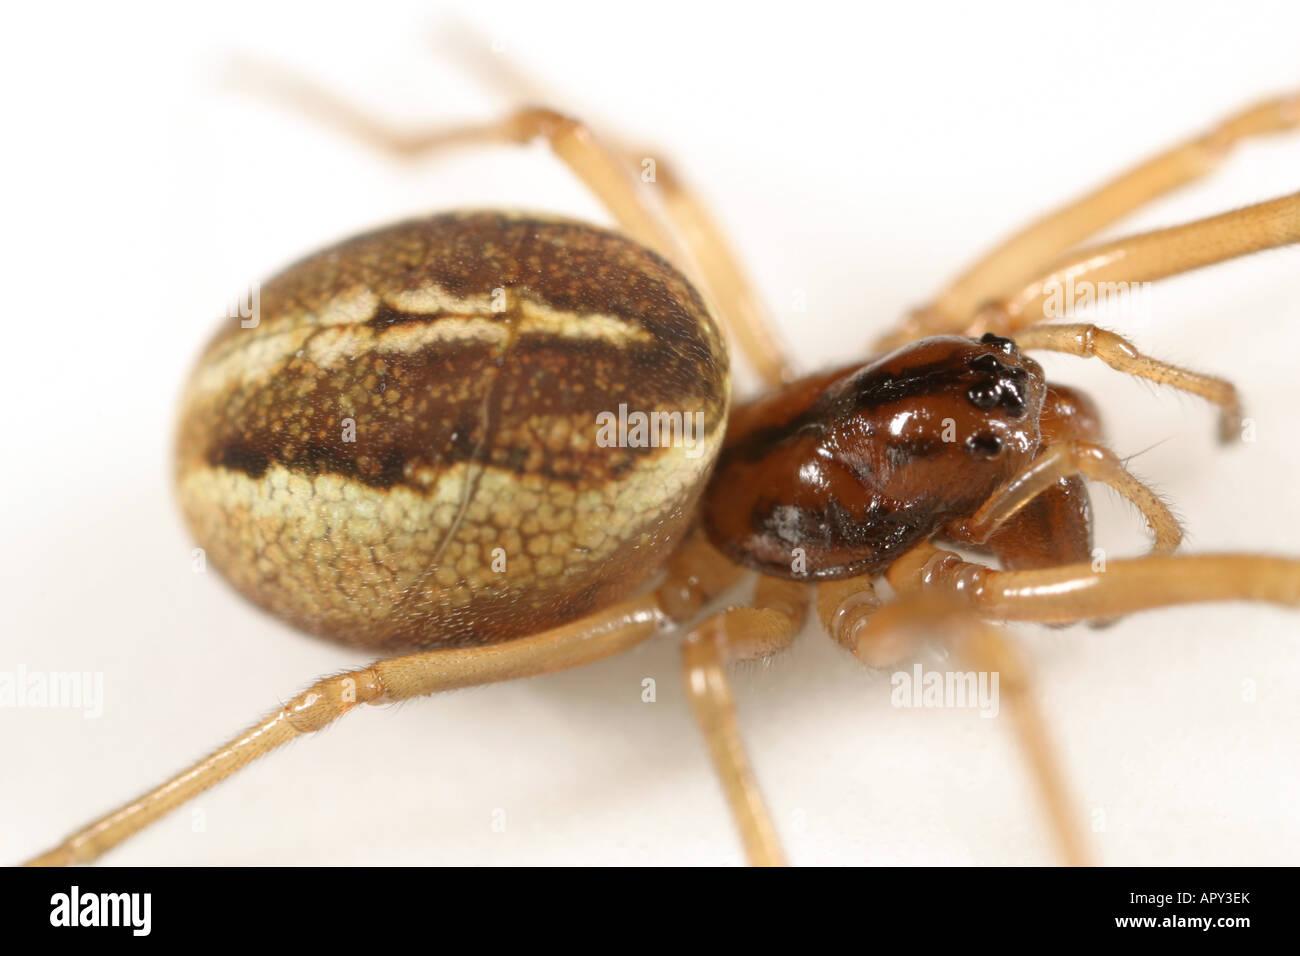 Female Pachygnatha clercki spider, Tetragnathidae family, on white background. - Stock Image